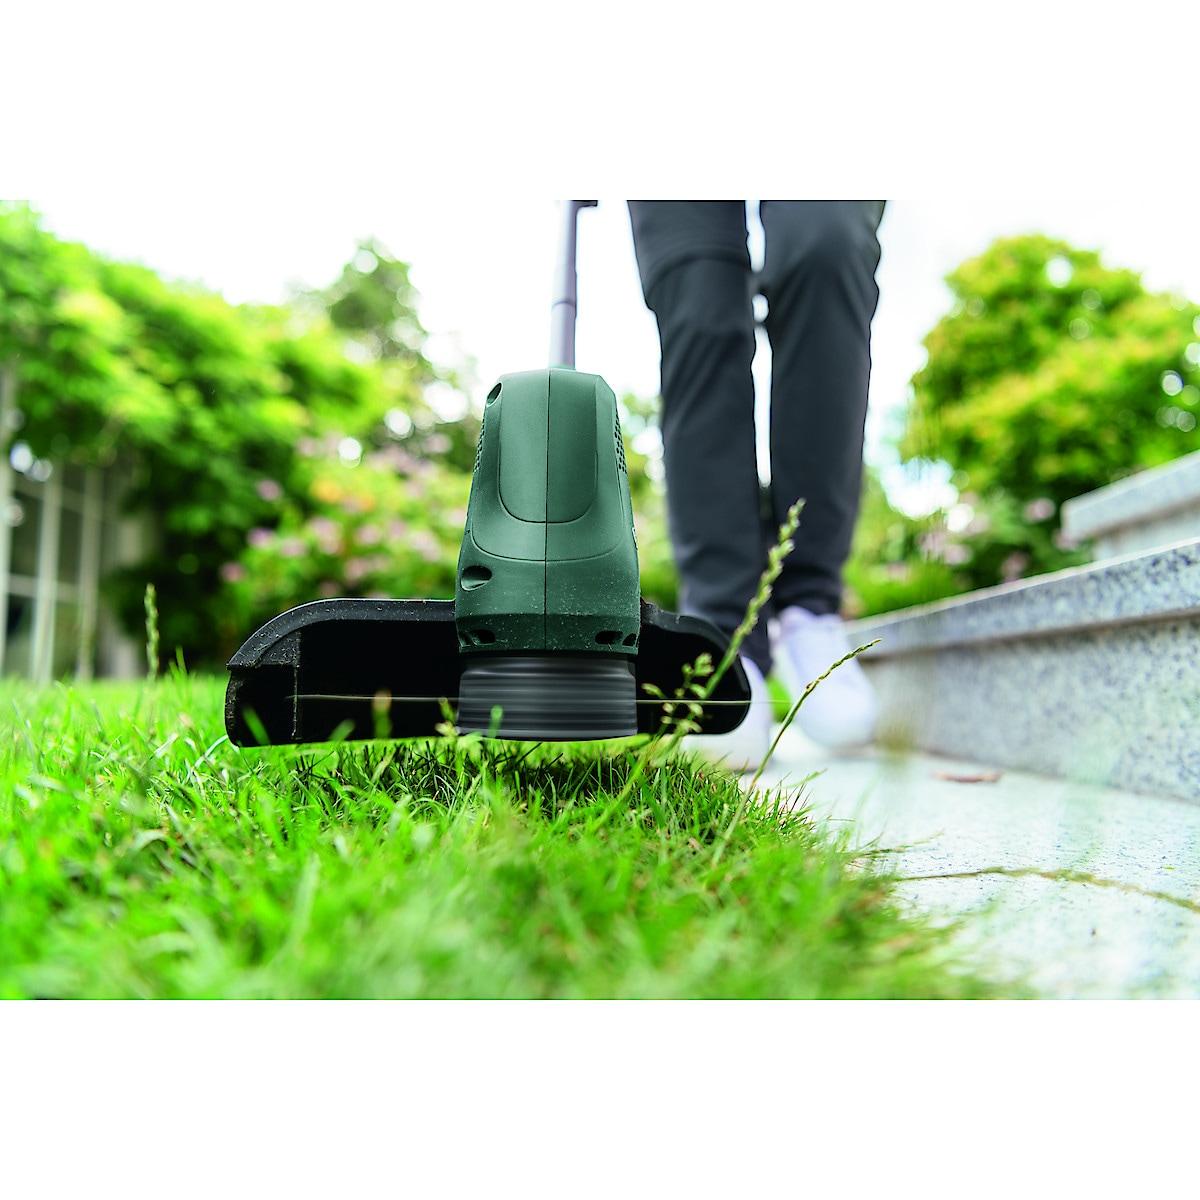 Ruohotrimmeri BoschEasy Grasscut 18-230